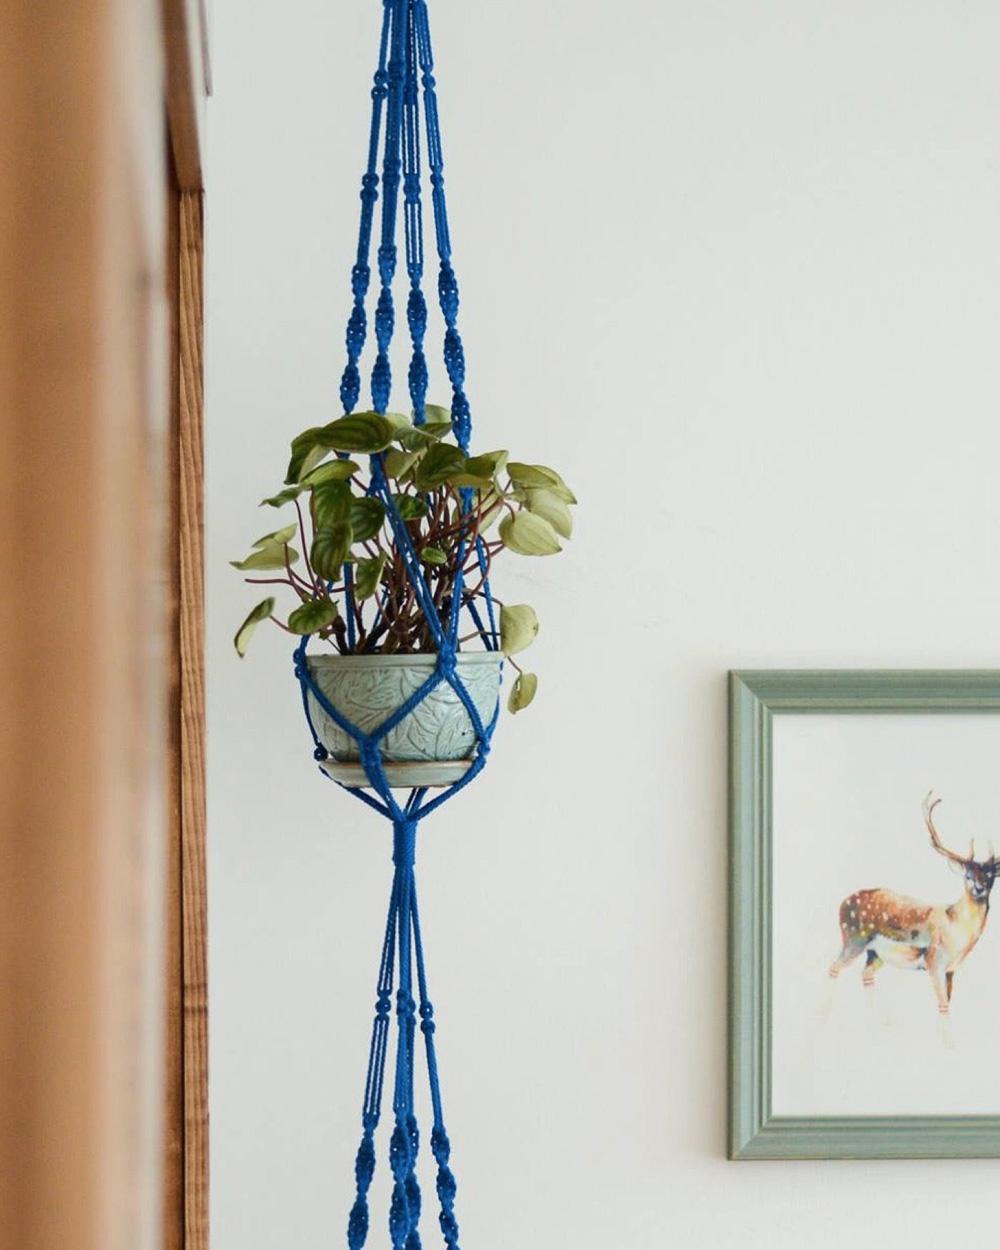 suspension plante diy macramé bleu